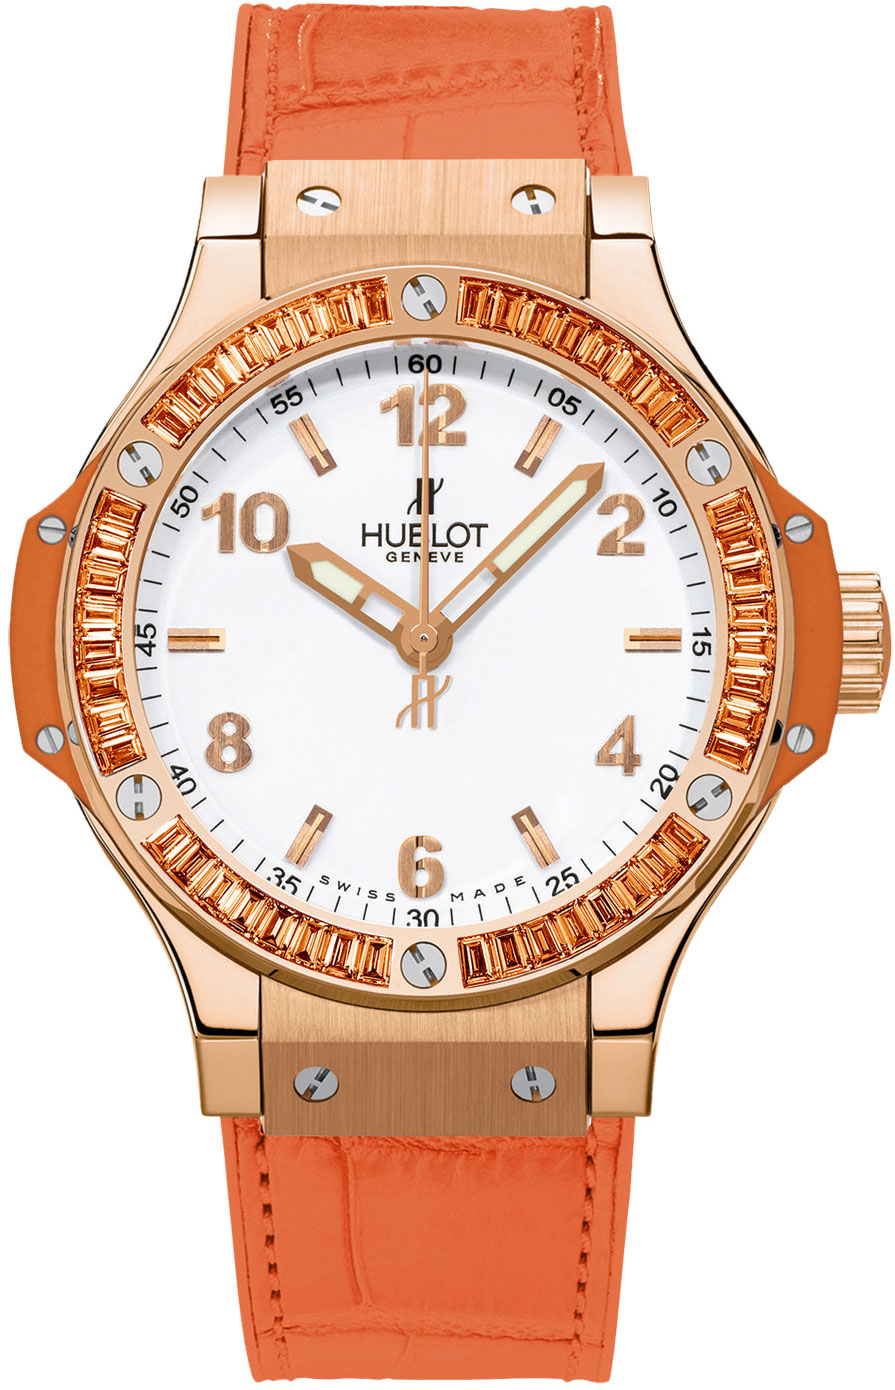 Image of Hublot Big Bang 38mm Ladies Watch Model 361.PO.2010.LR.1906